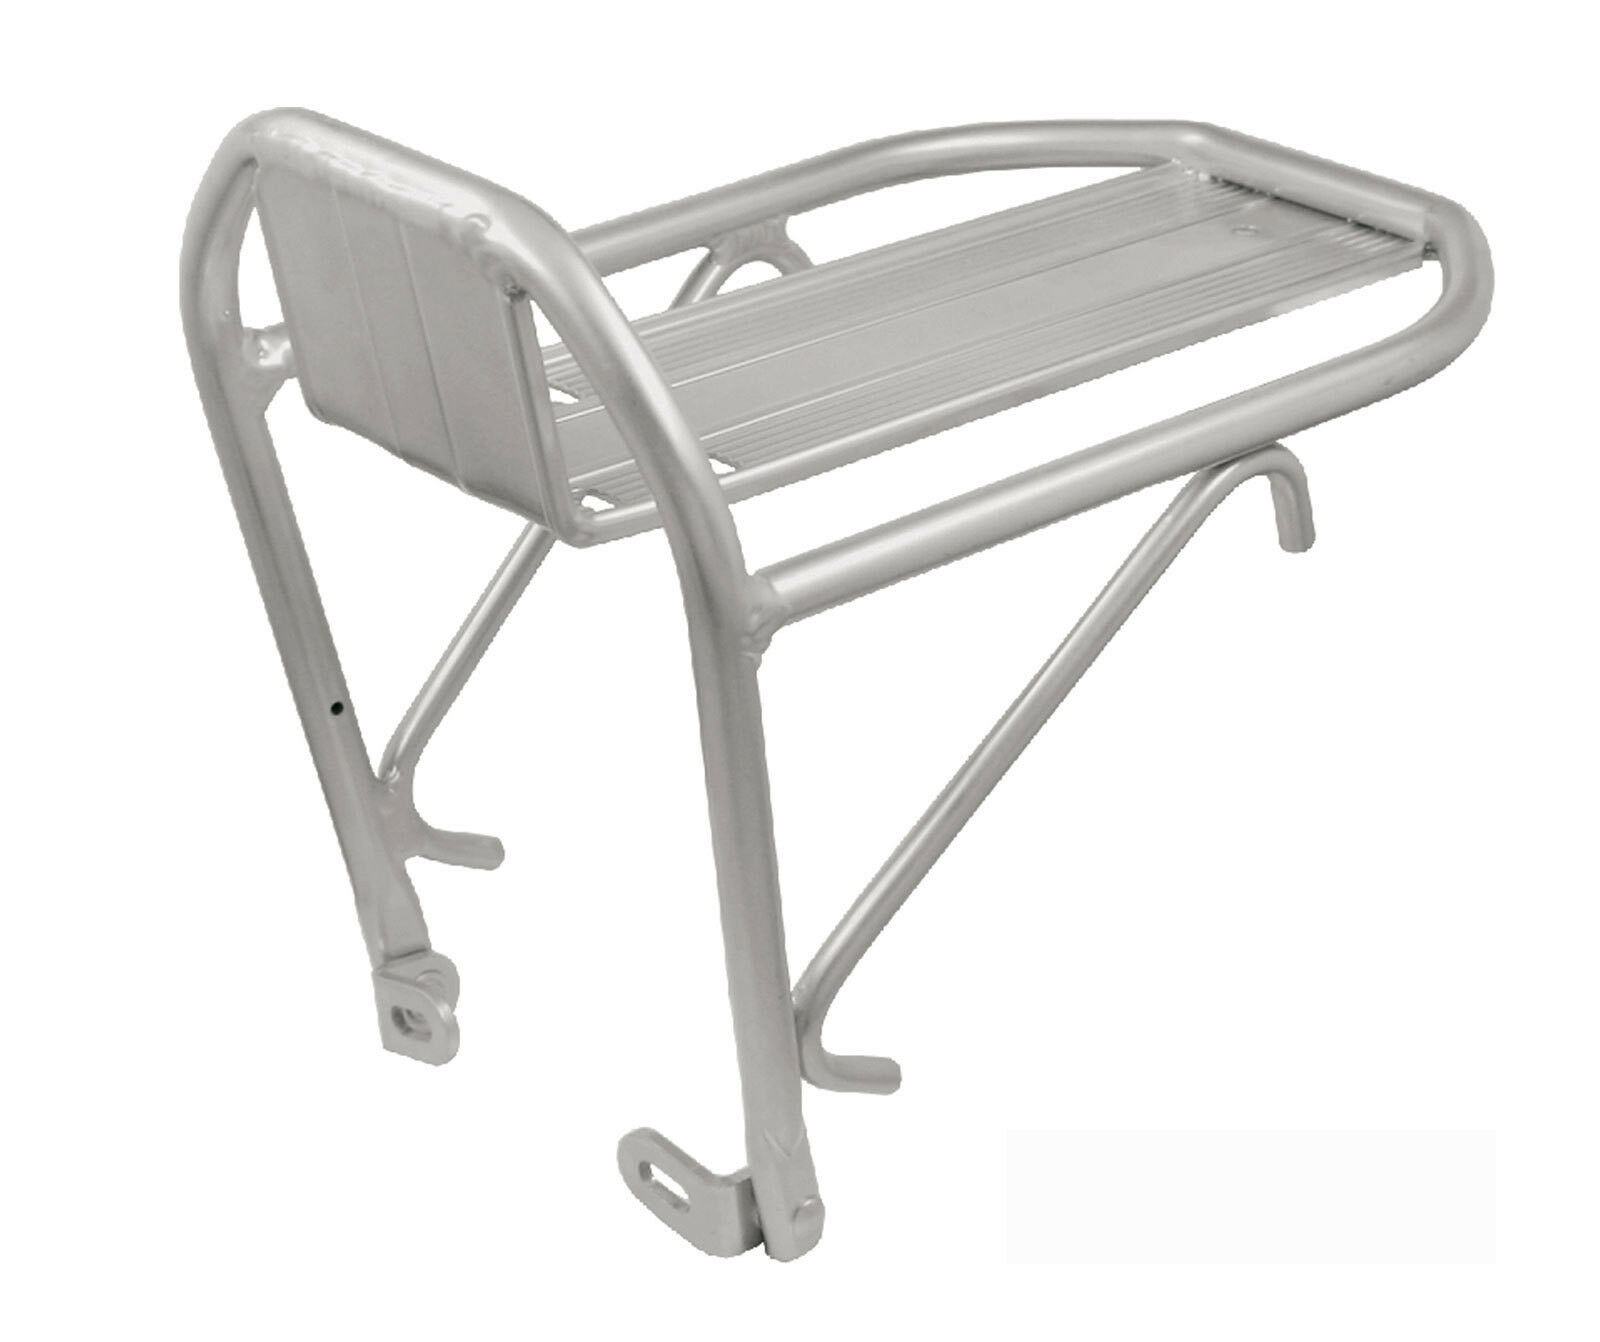 Porta Bultos Alforja Aluminio Plata Delantero Anclaje a Frenos de Bicicleta 6002